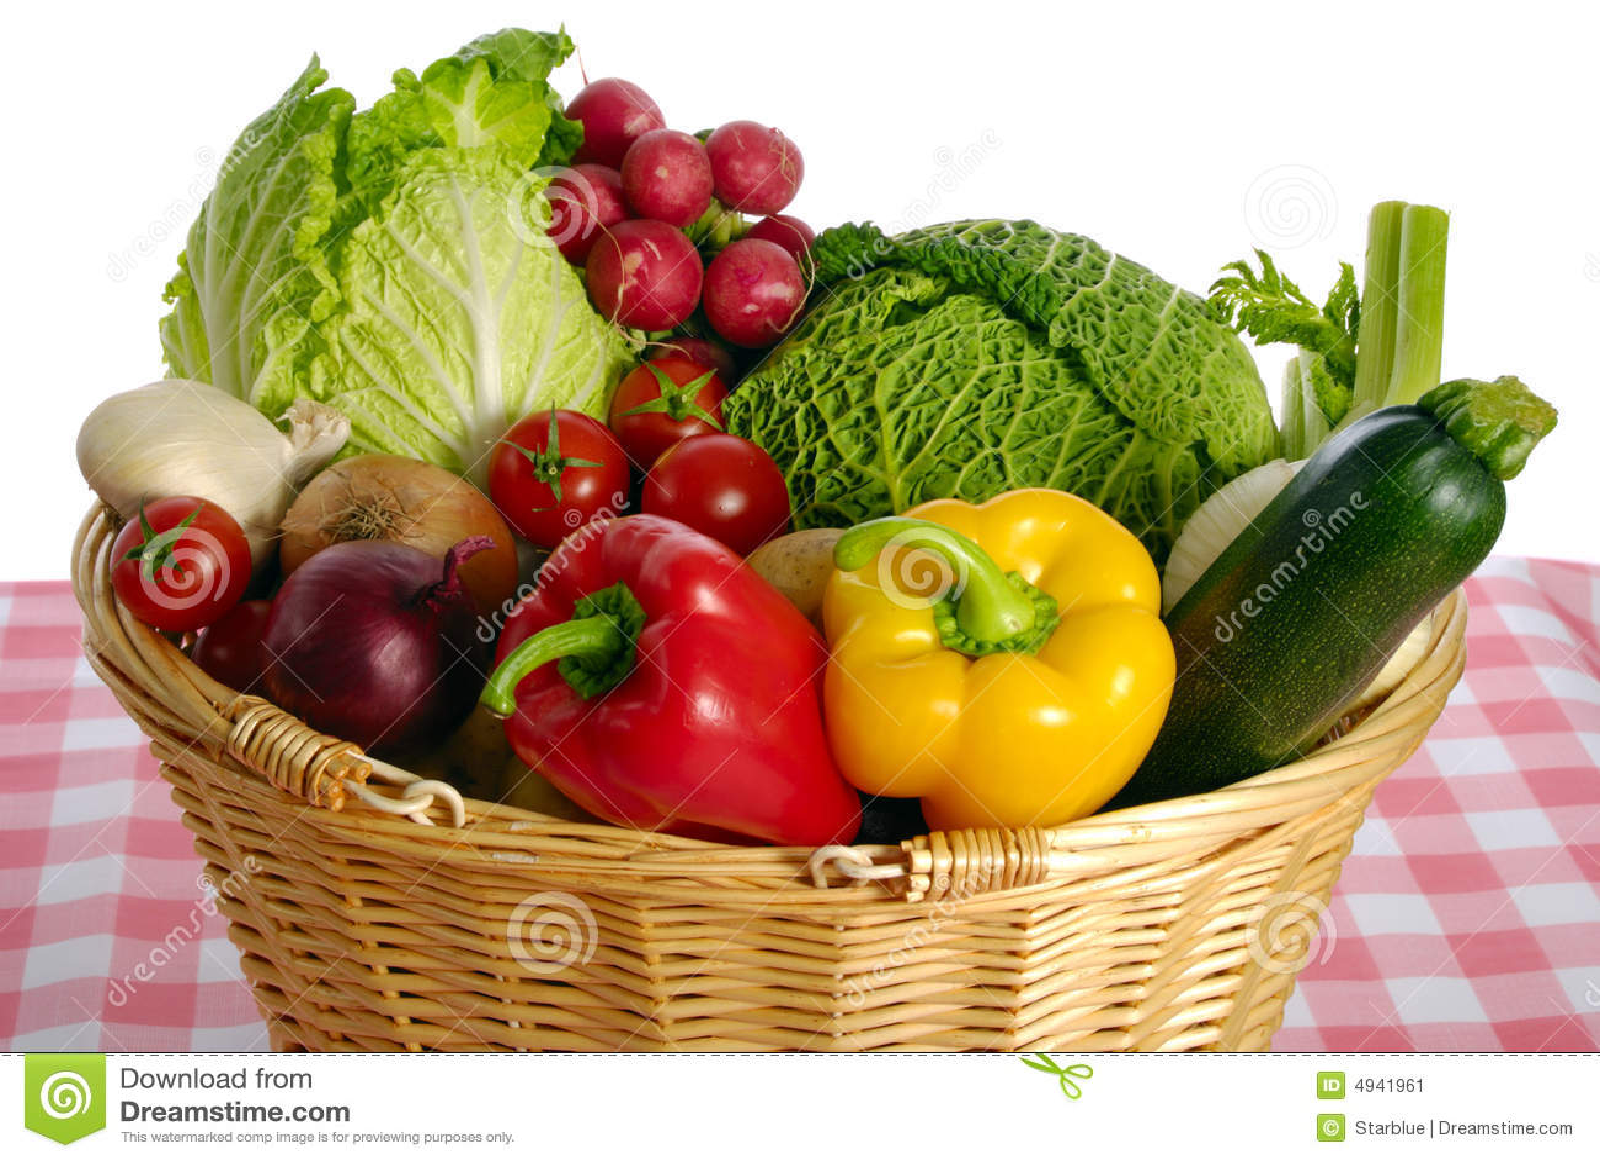 Basket Full Of Vegetables Stock Image. Image Of Background